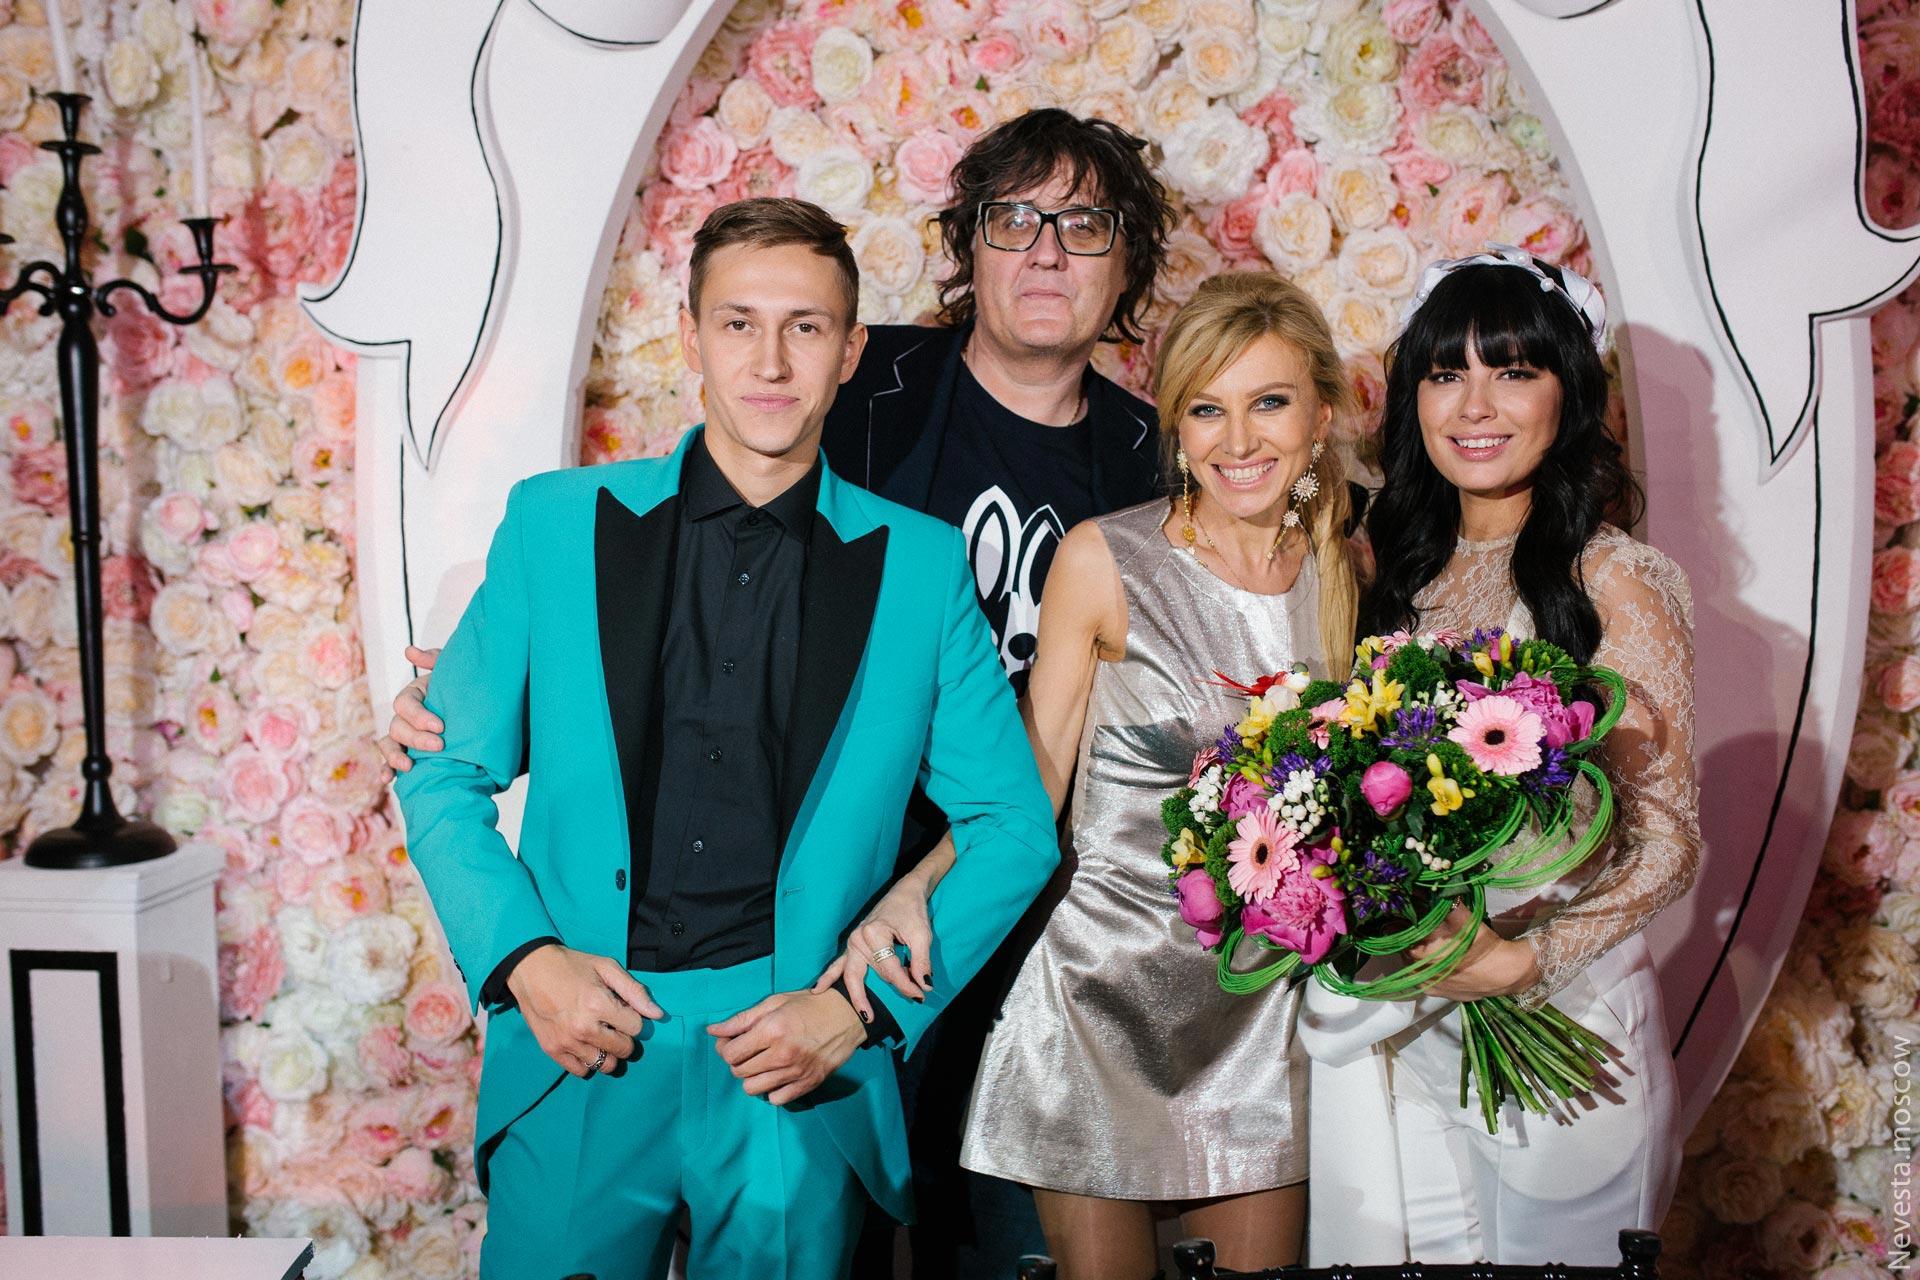 Свадьба Нелли Ермолаевой и Кирилла Андреева фото 45